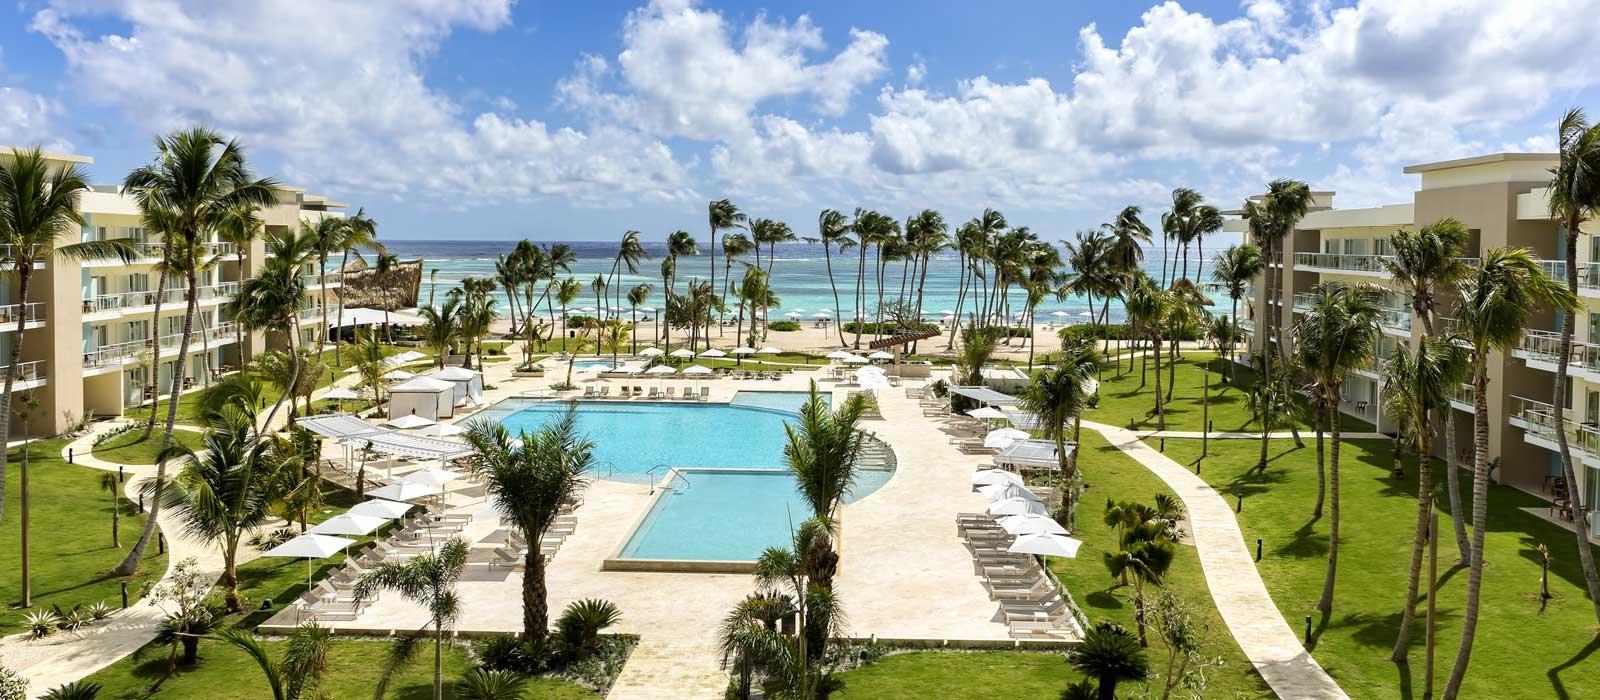 PIC-Westin_Puntacana_Pool___Property.jpg